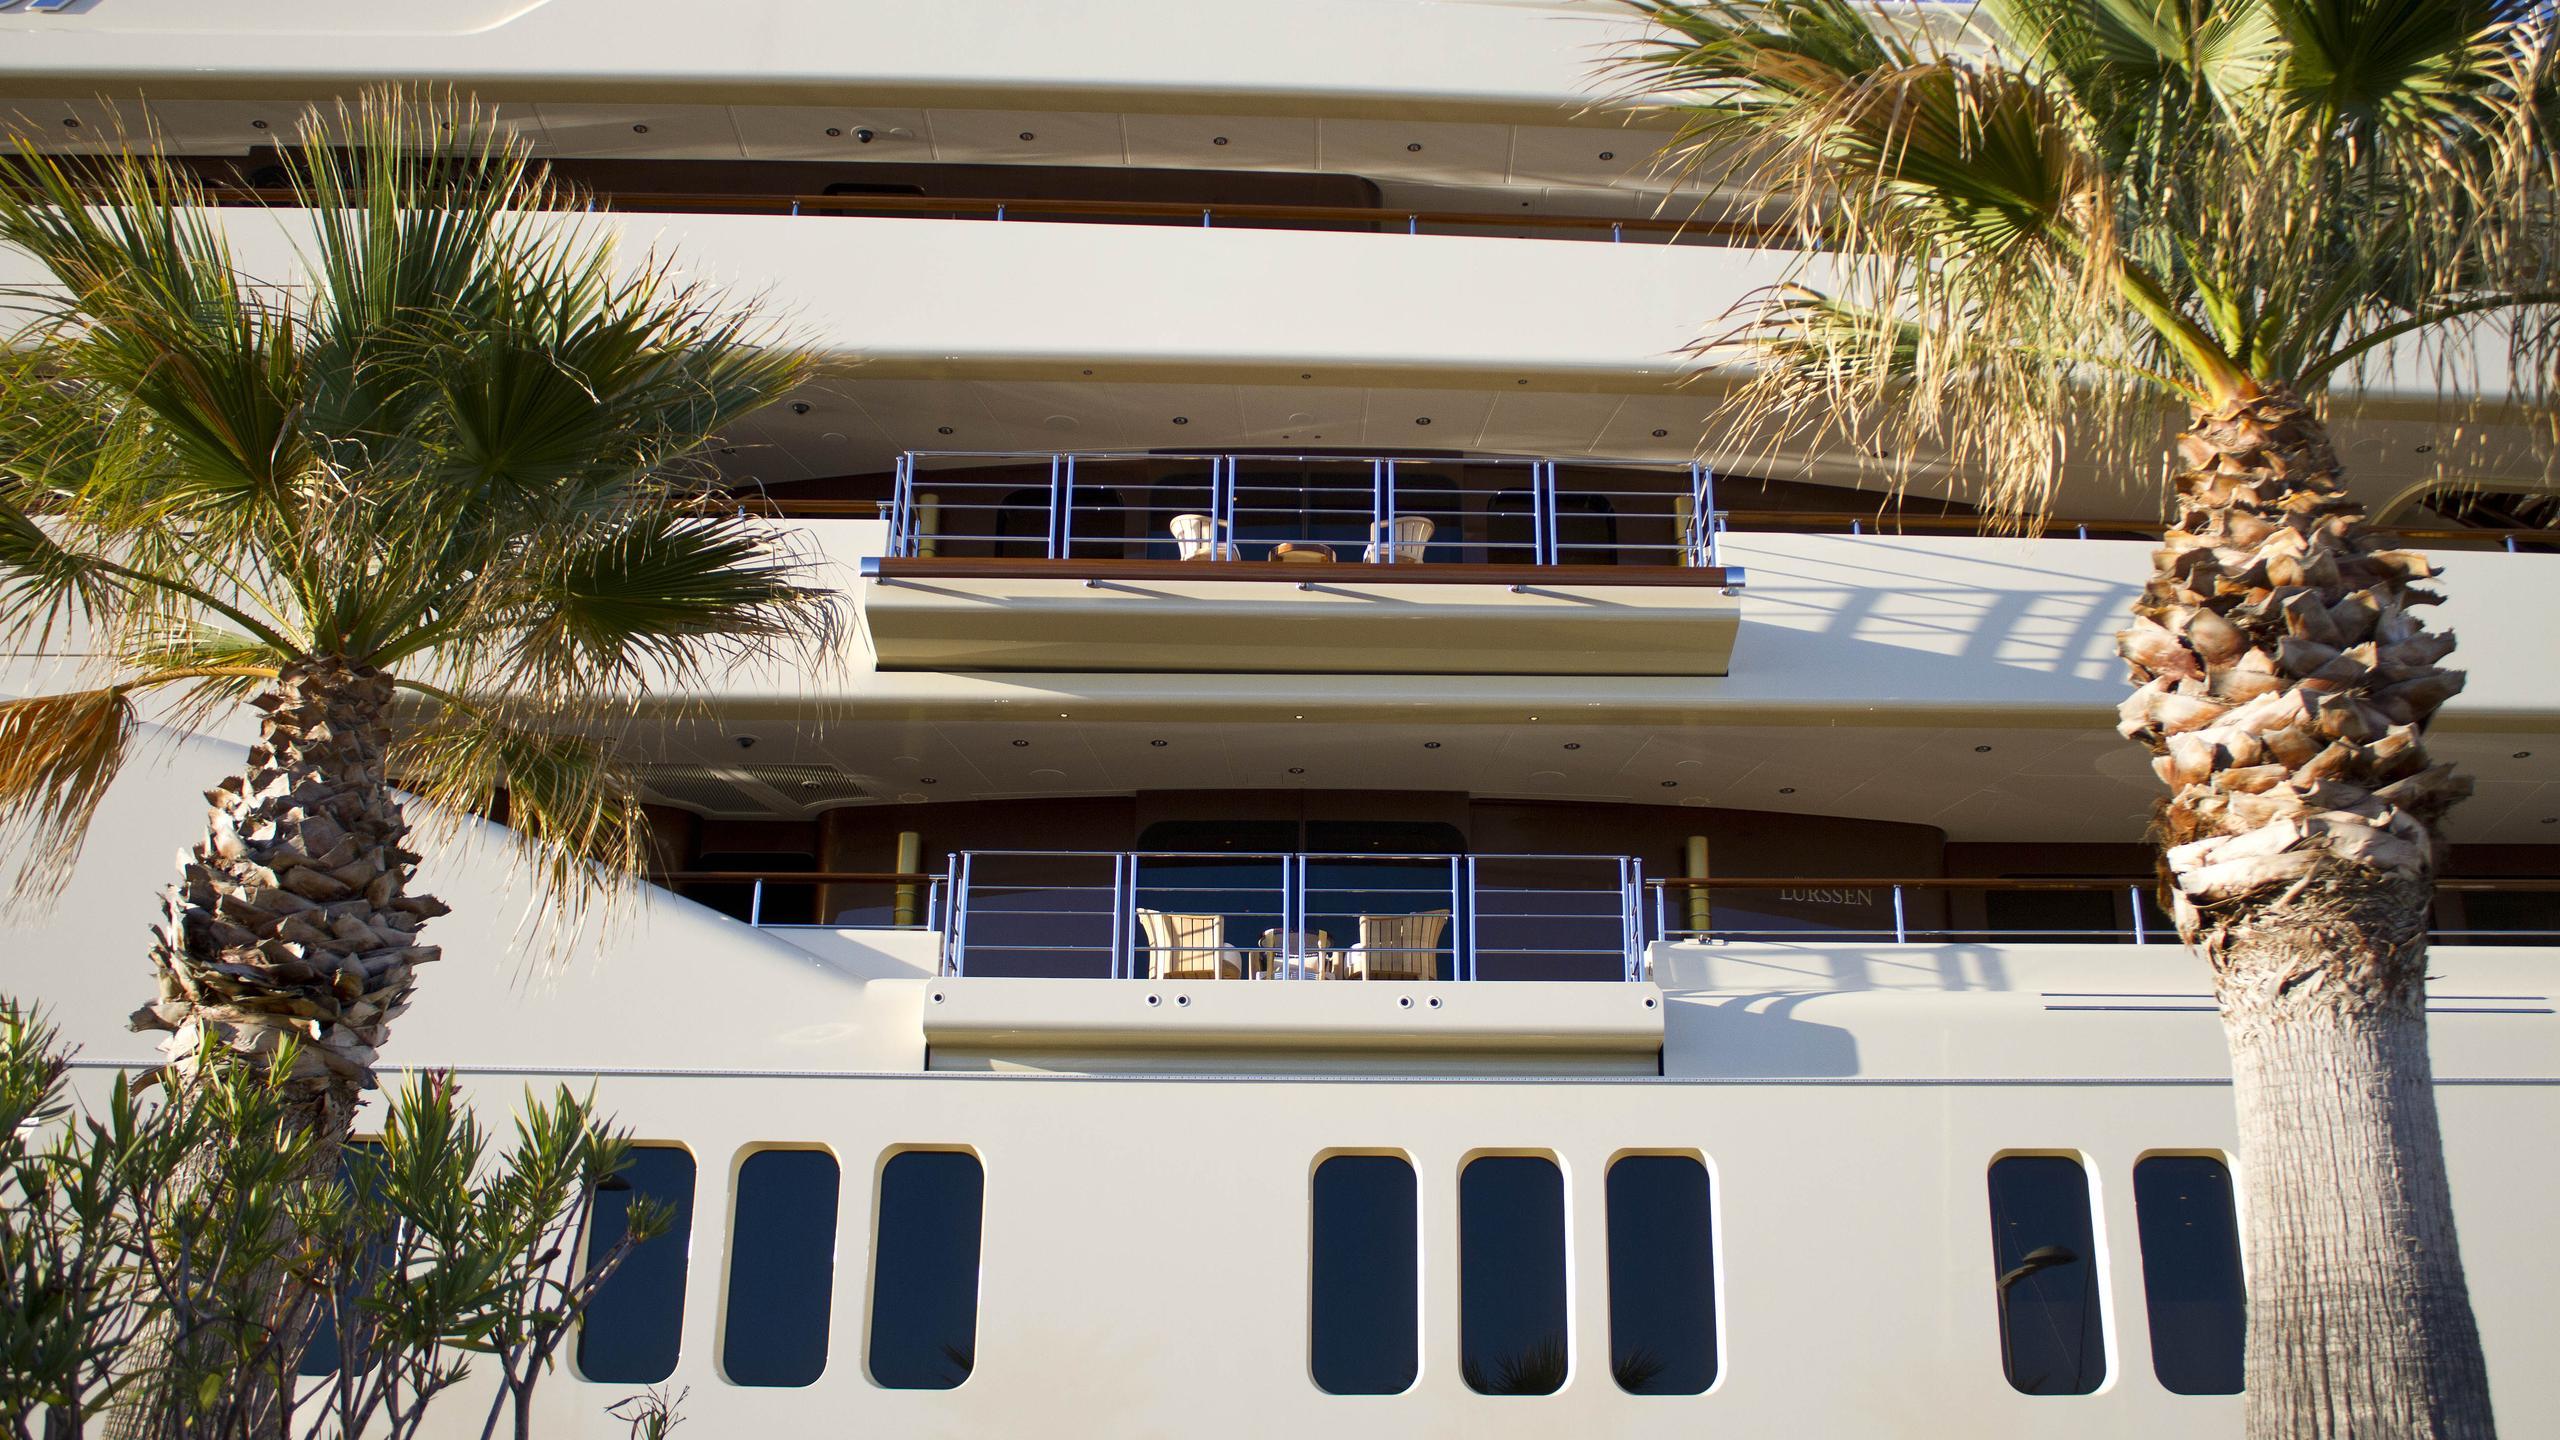 dilbar-motor-yacht-lurssen-2016-156m-side-balconies